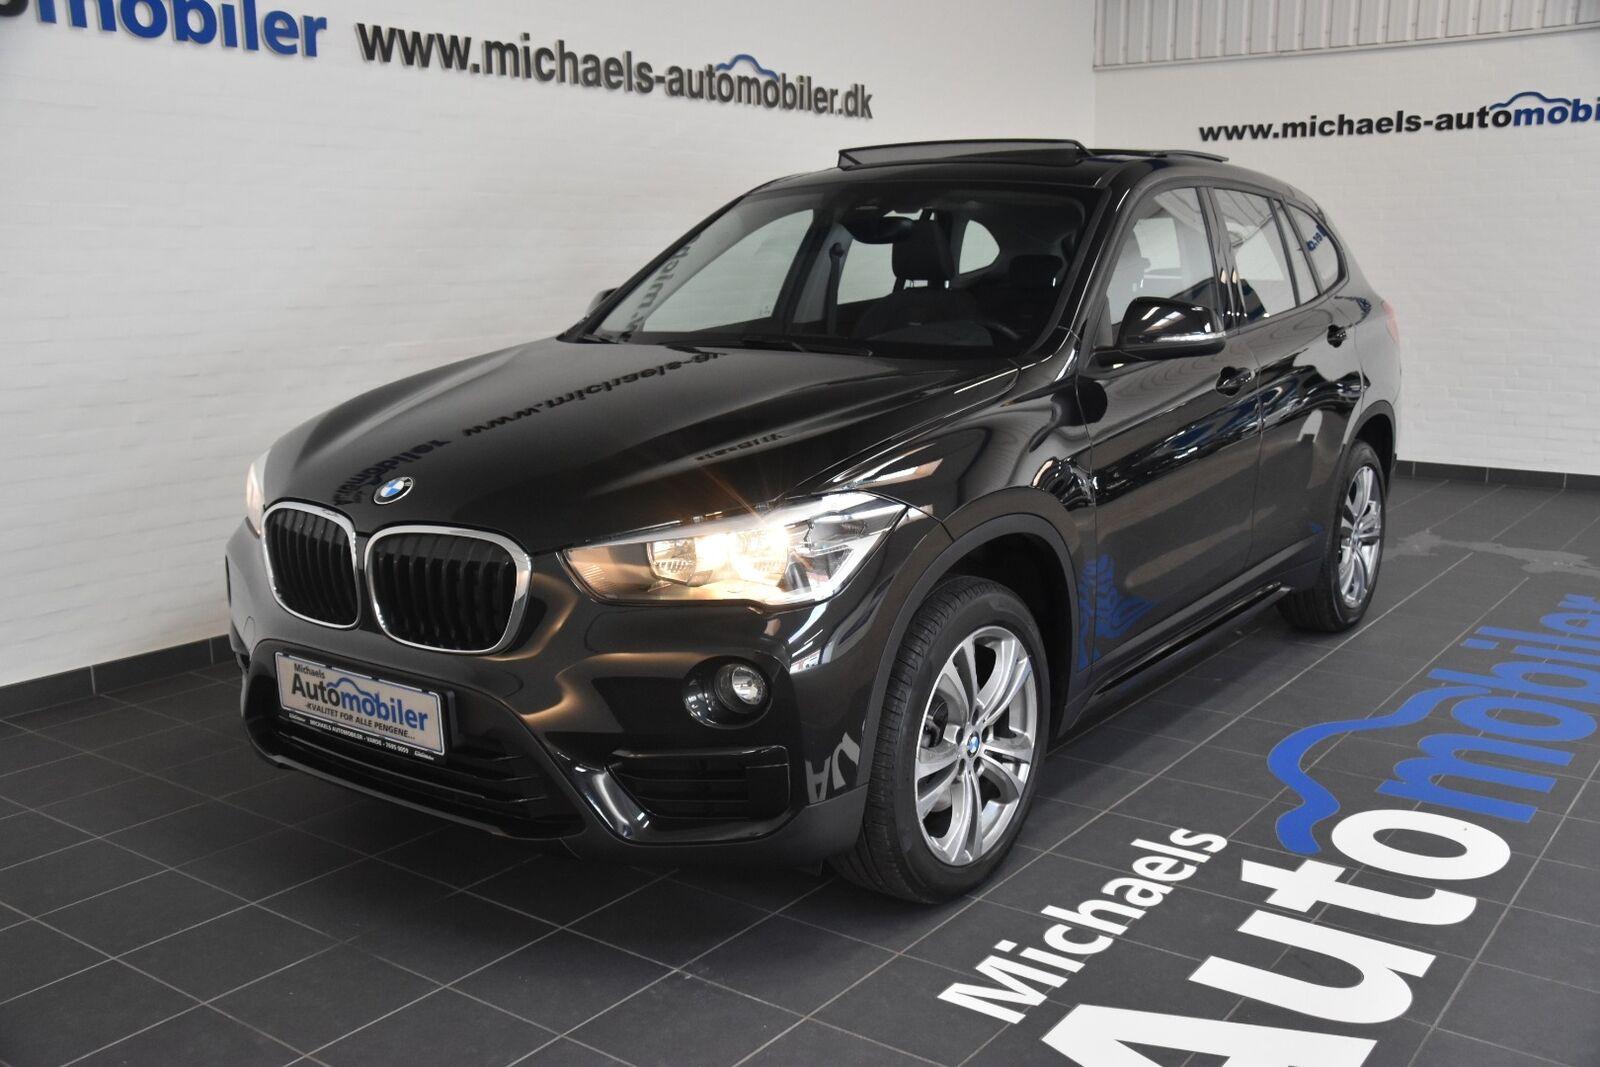 BMW X1 1,5 sDrive18i 5d - 339.900 kr.